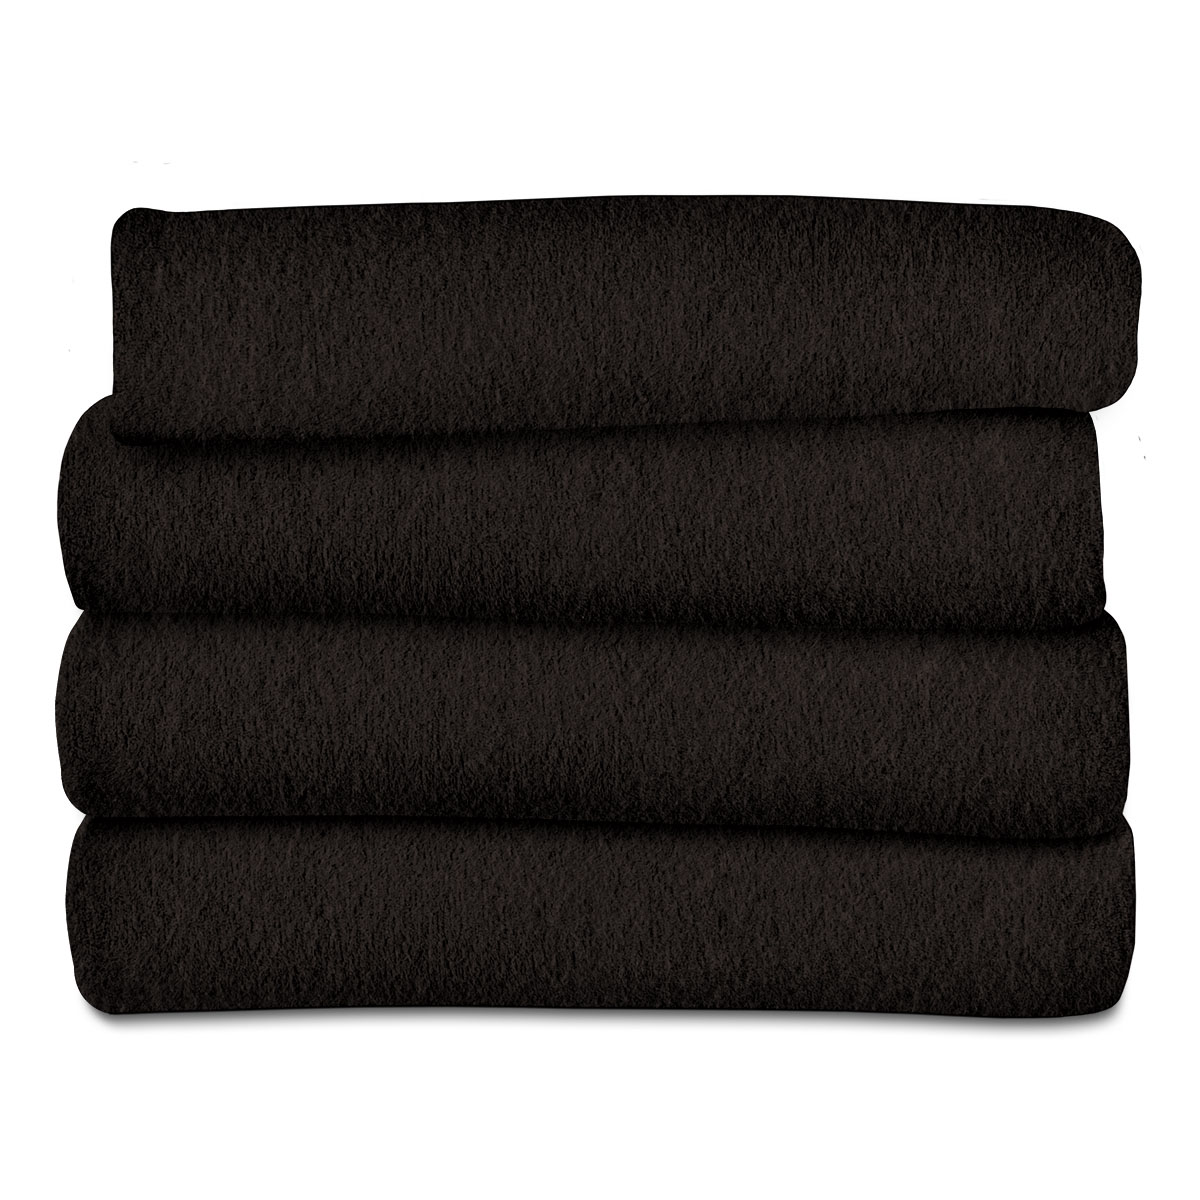 Sunbeam® Fleece Heated Throw Walnut TSF8VS R470 31B50 Sunbeam  #1B1714